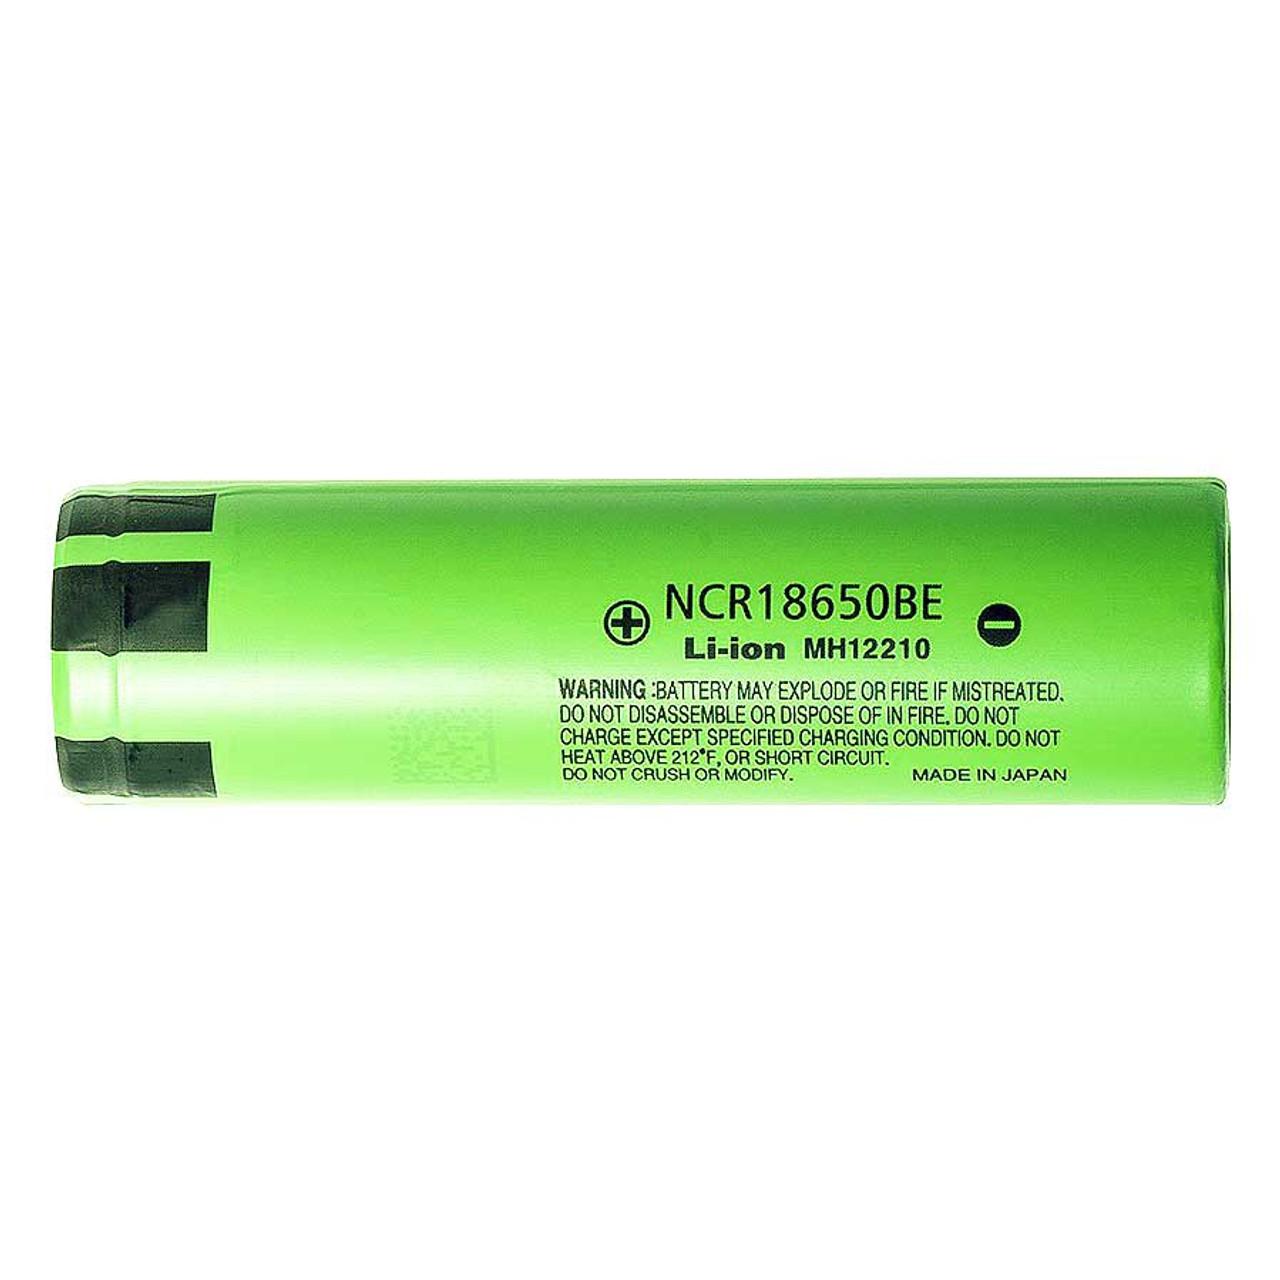 18650 Battery Panasonic Ncr18650be 3200mah Rechargeable Li